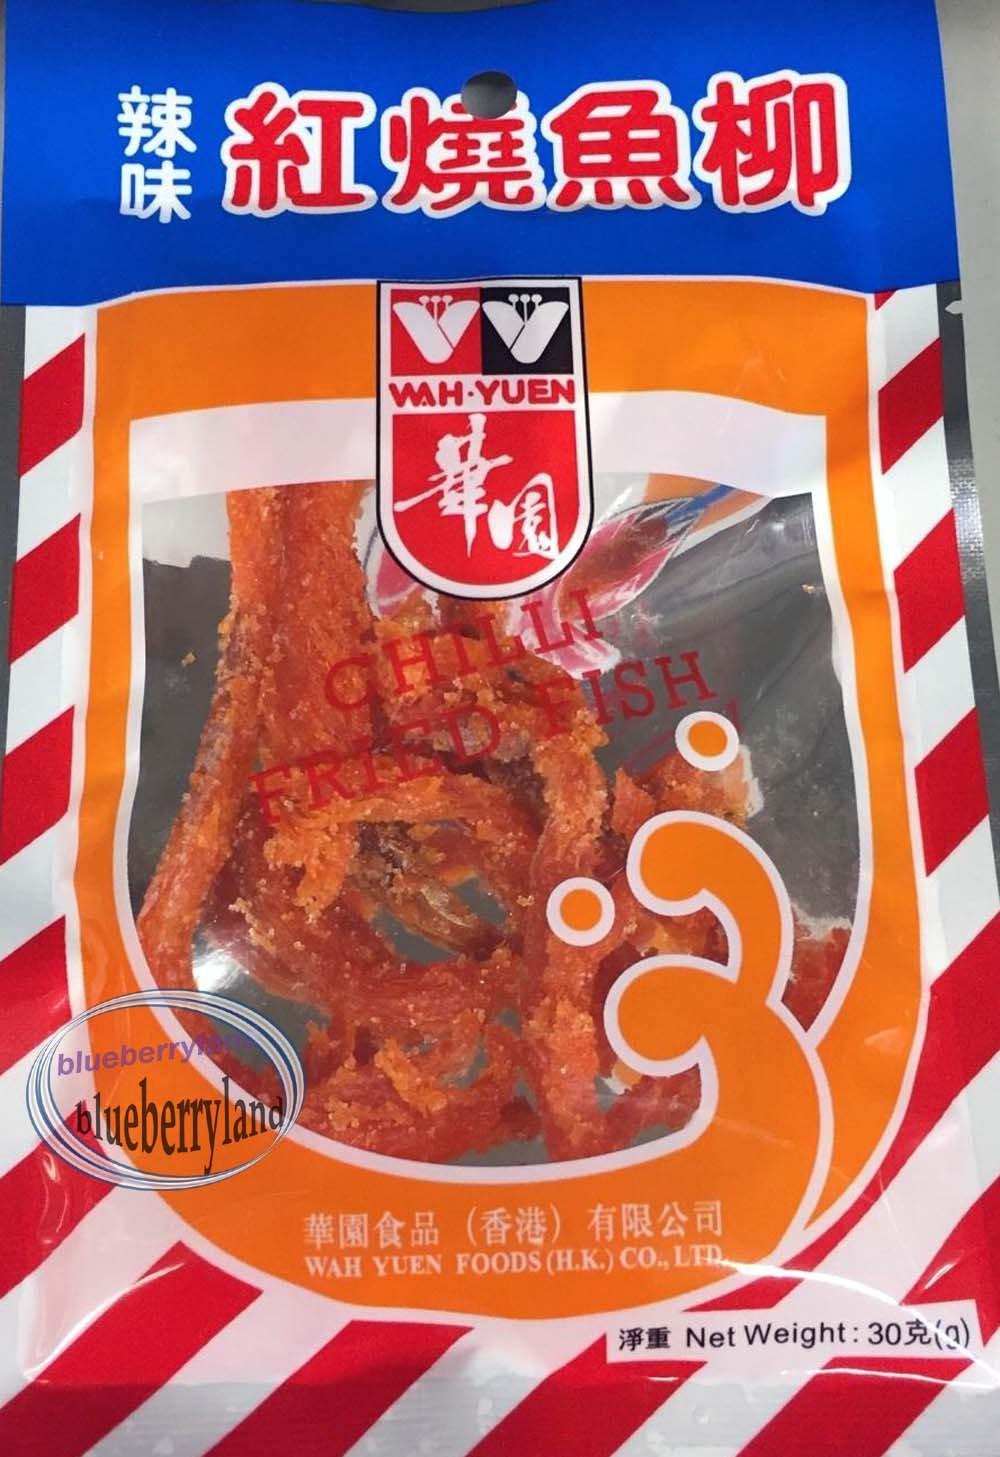 Wah Yuen Dried Prepared Chili Fried Fish 30g x5 ��辣����� snacks